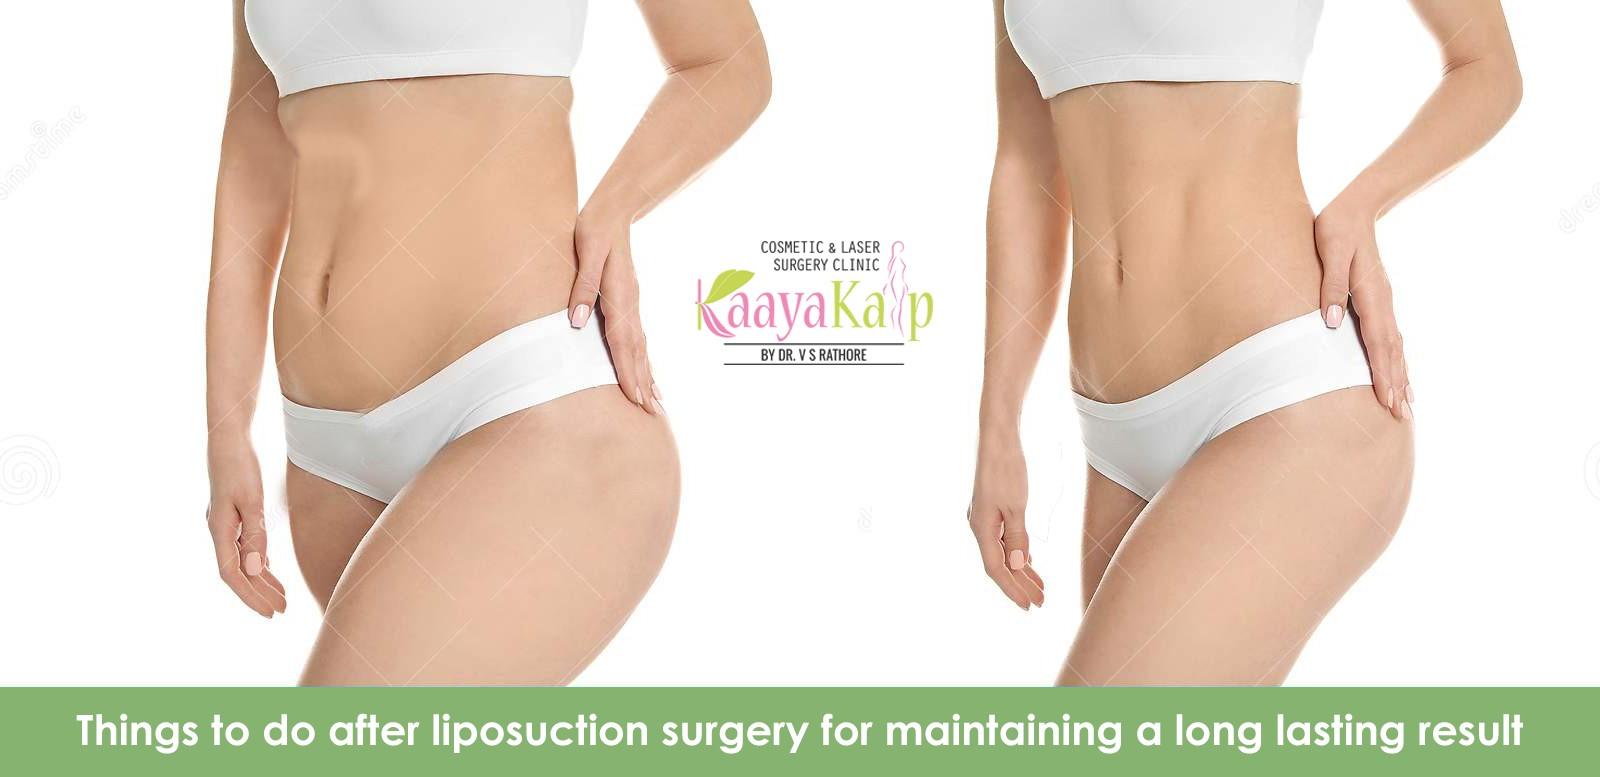 Kaayakalp What to do after liposuction surgery ?